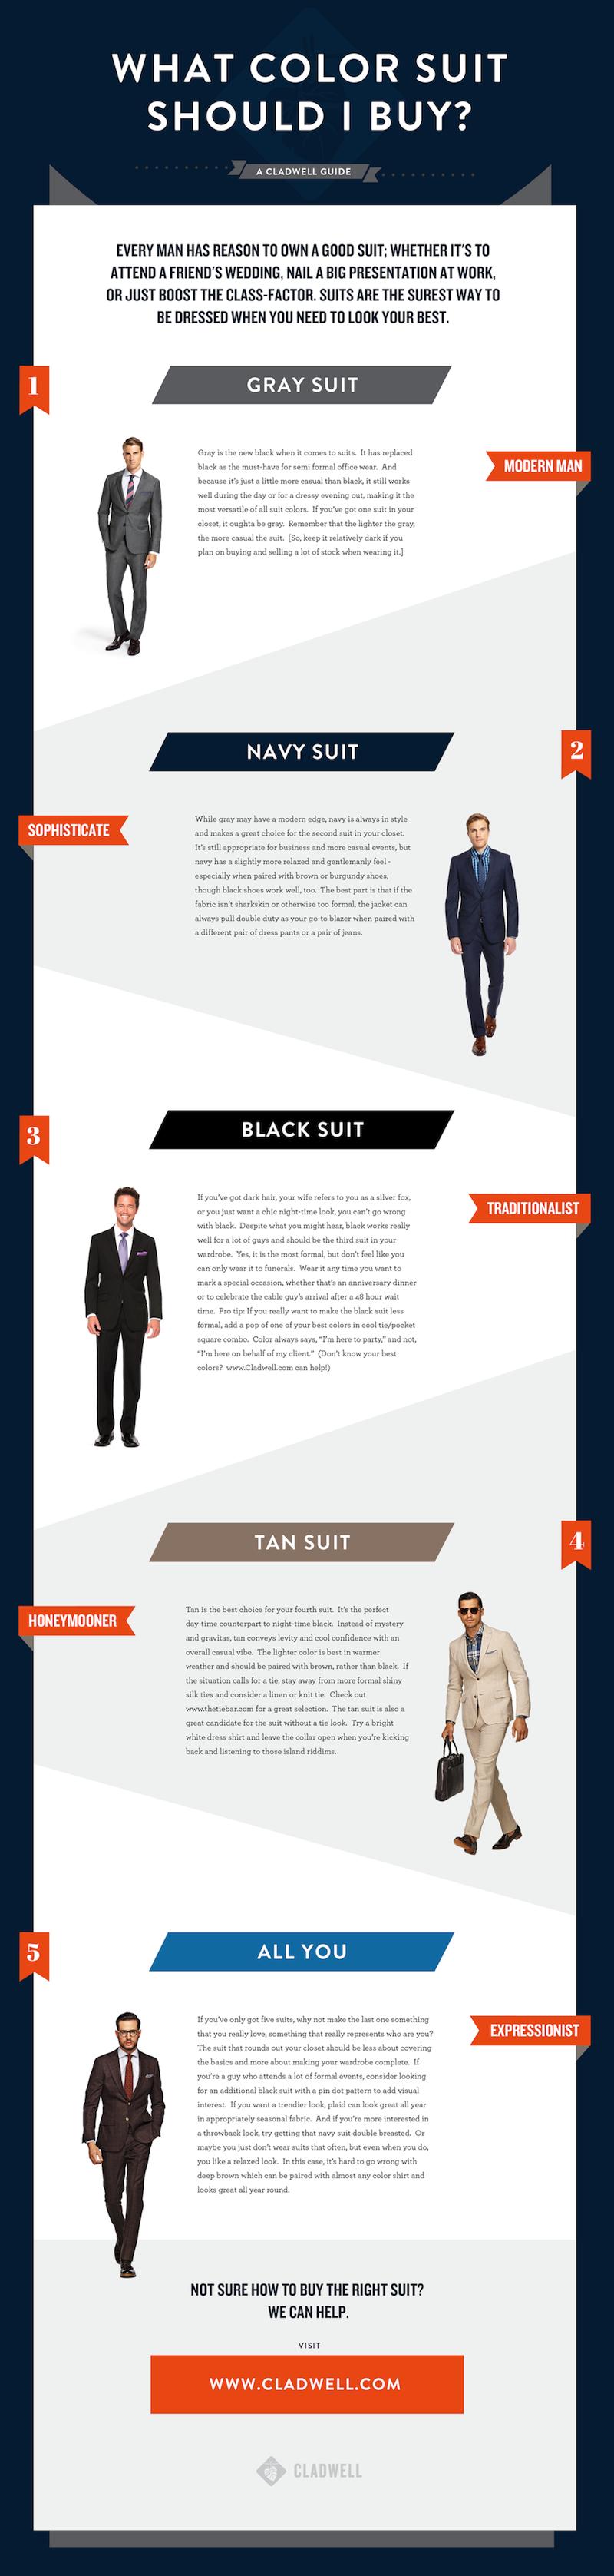 What Color Suit Should I Buy? - Men's Suit Coloring Guide Repin & Follow my pins for a FOLLOWBACK!